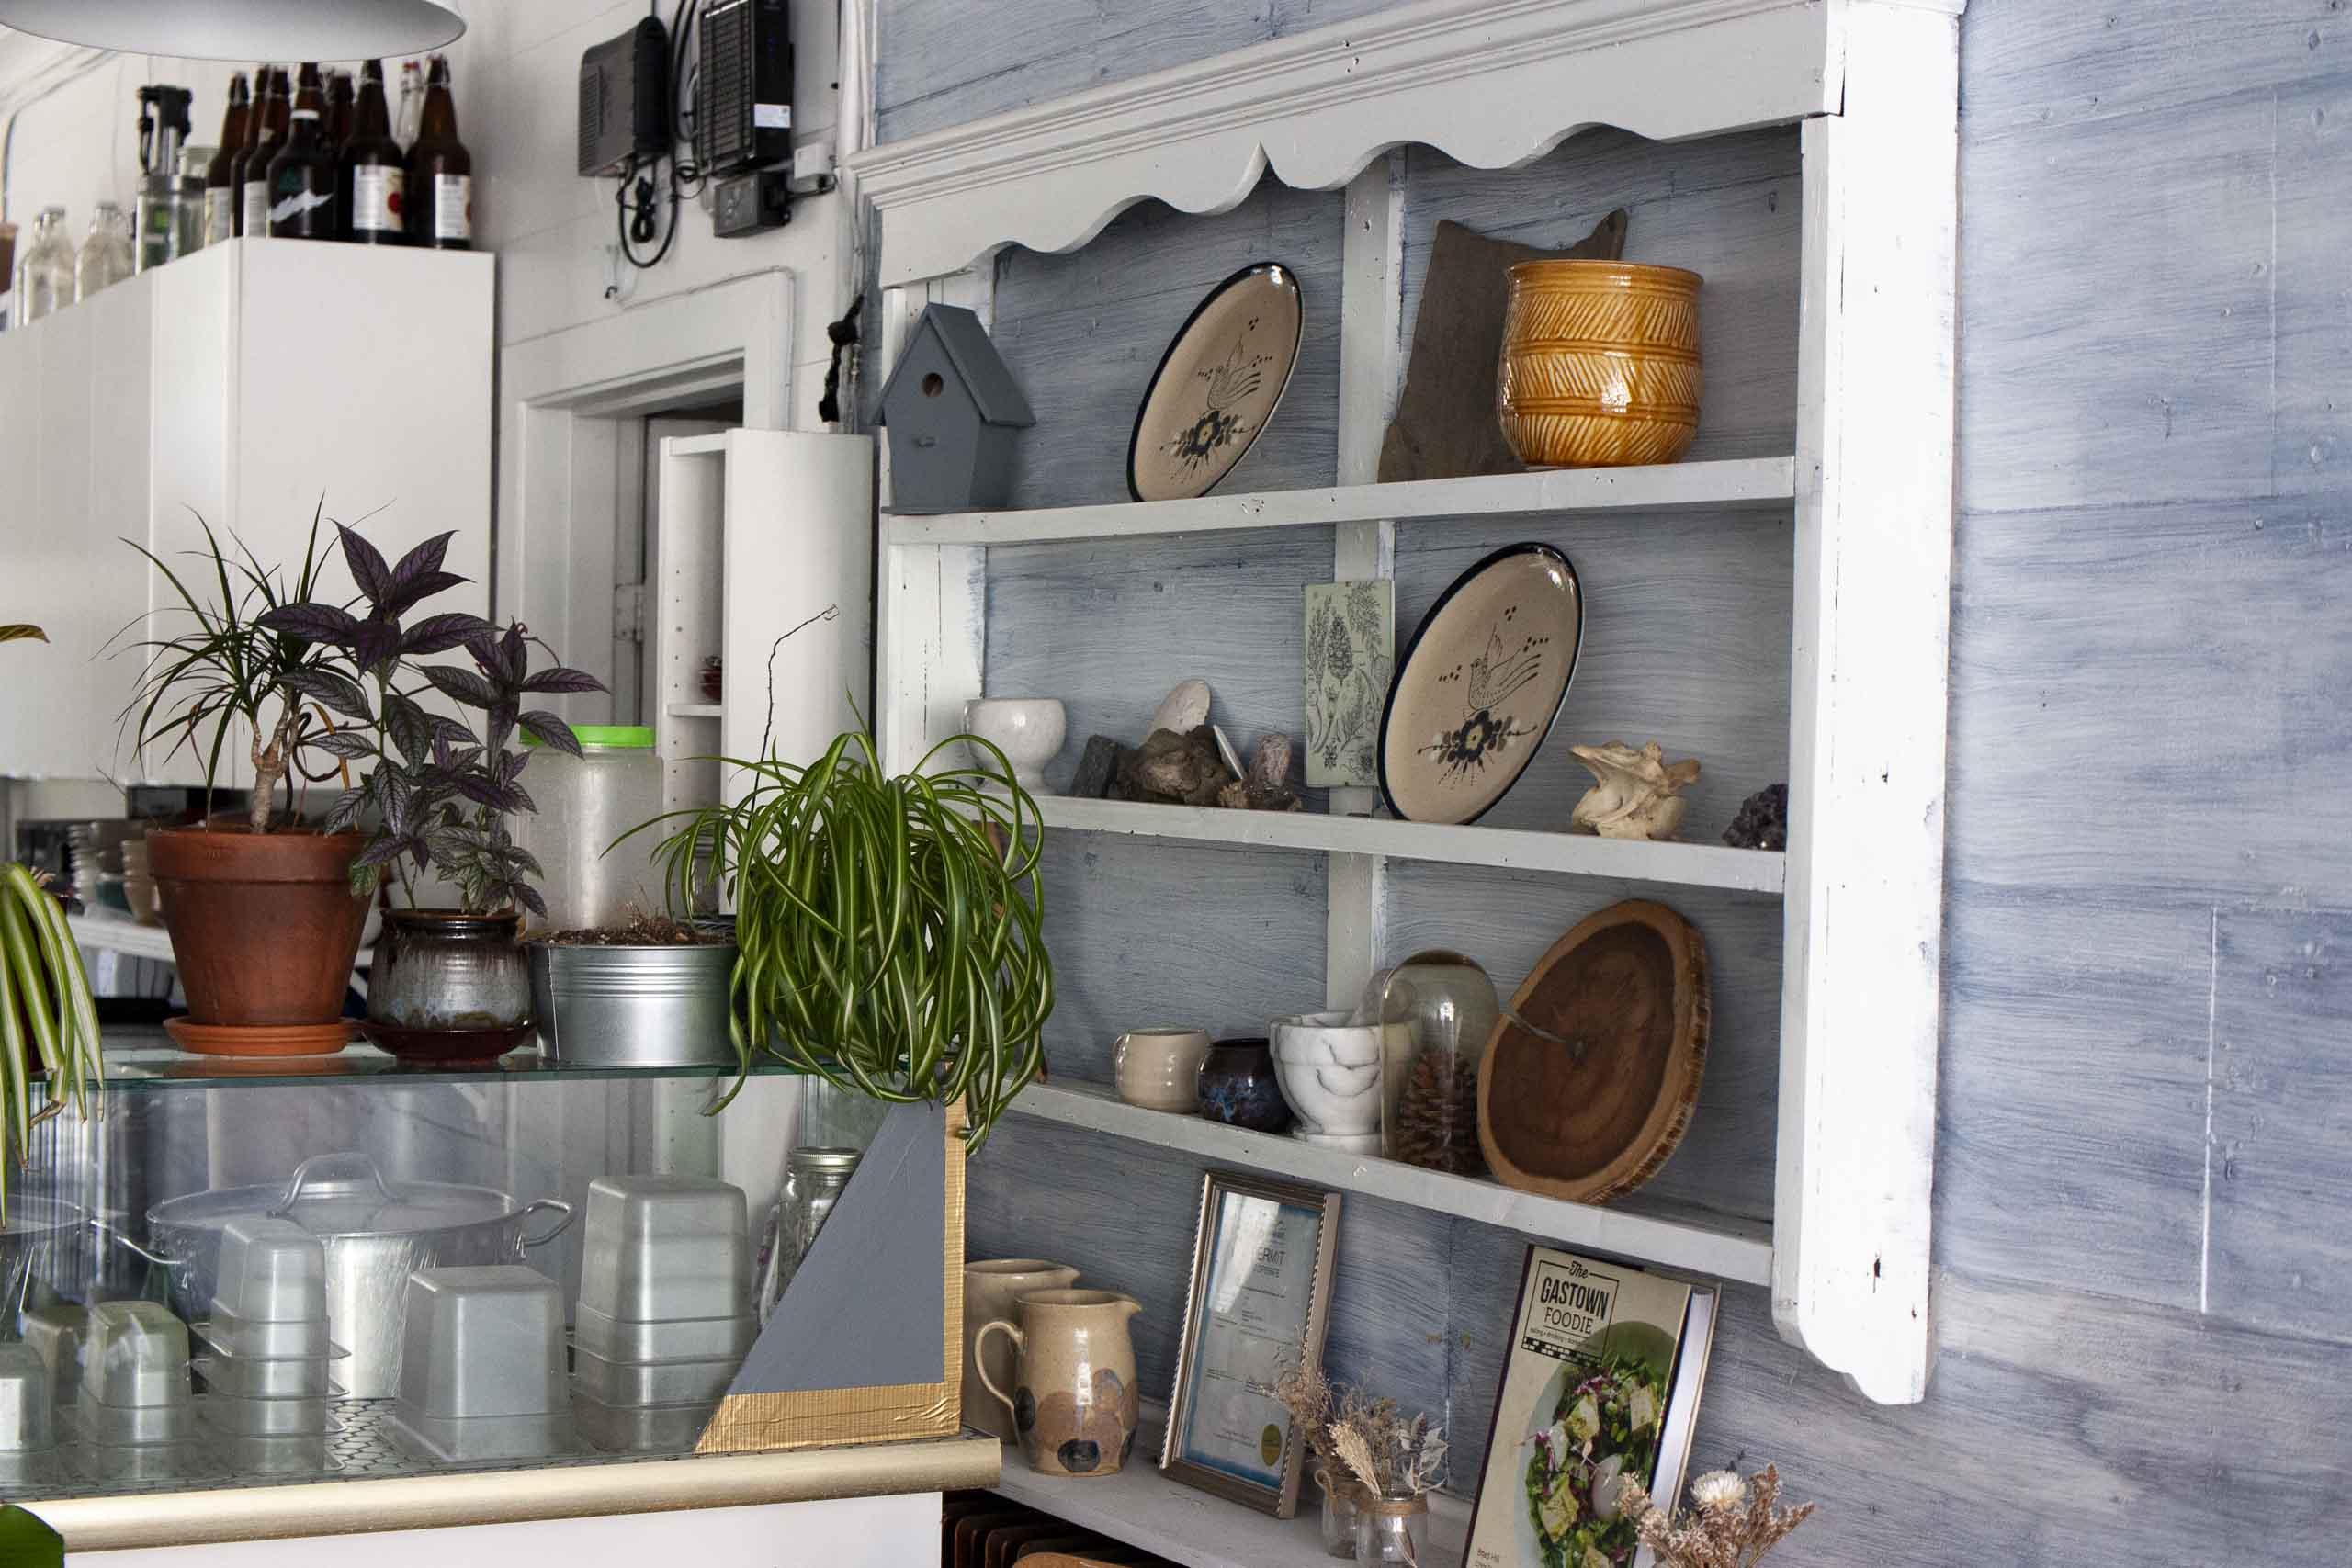 SOIL Restaurant Interior, shelves with plates — by Dima Yagnyuk.